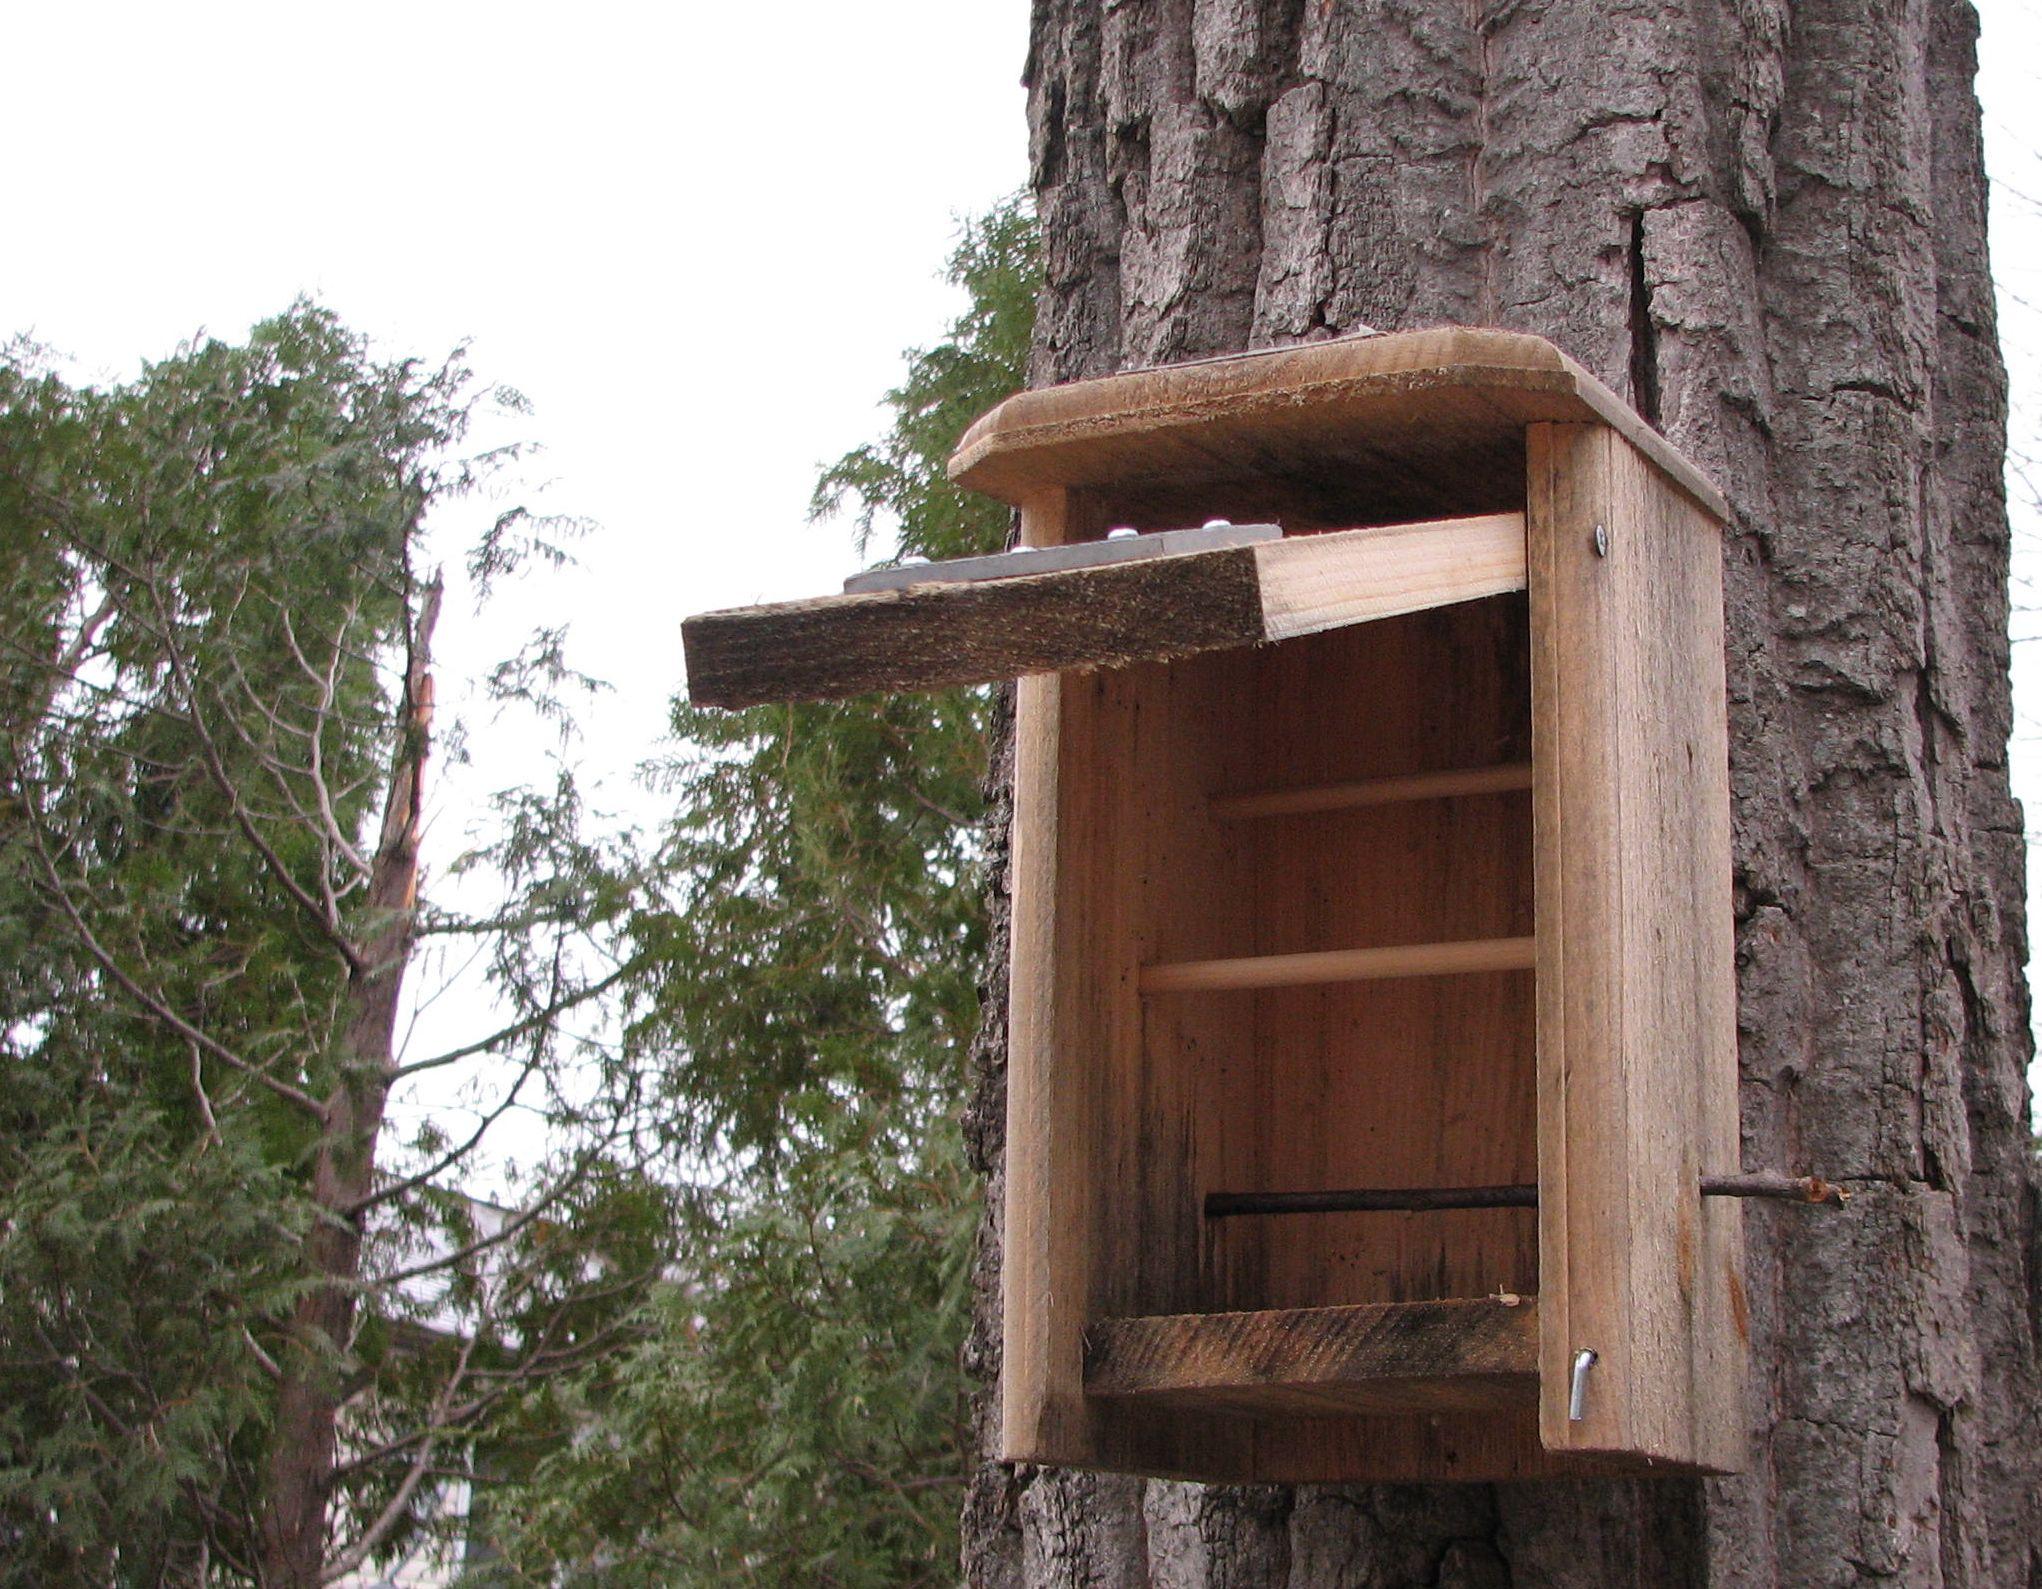 Winter Chickadee Accomodations Behind The Bins